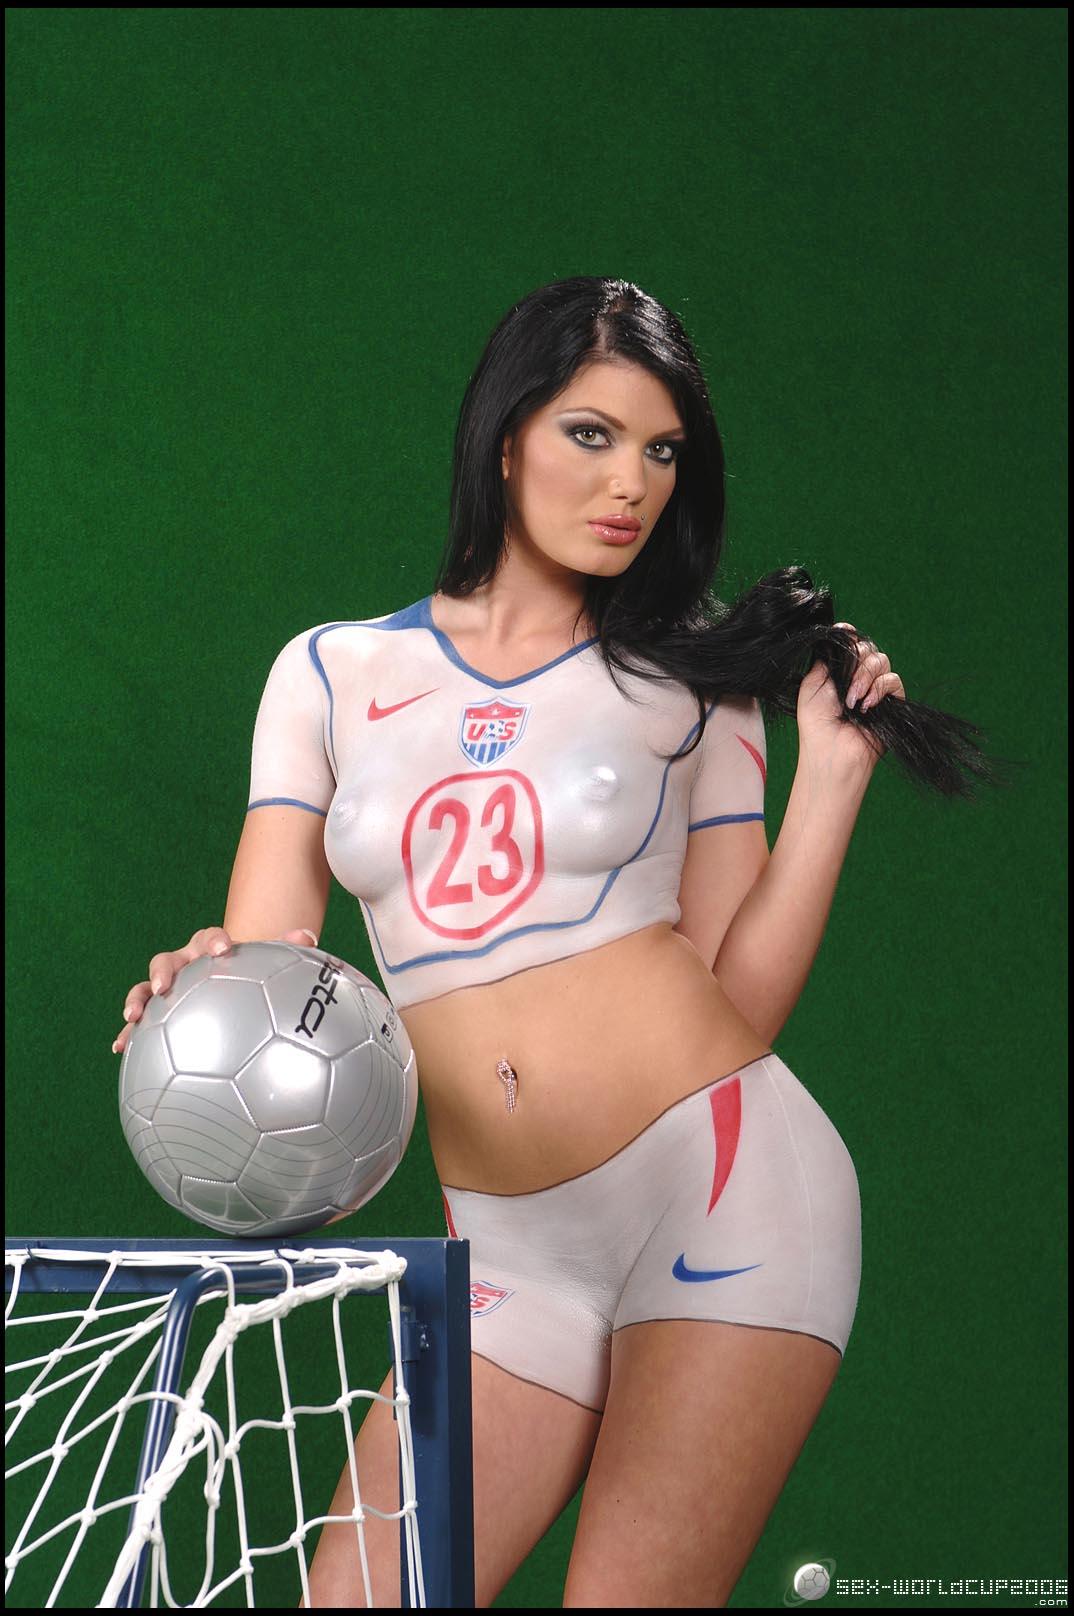 Эро футбол фото 23 фотография